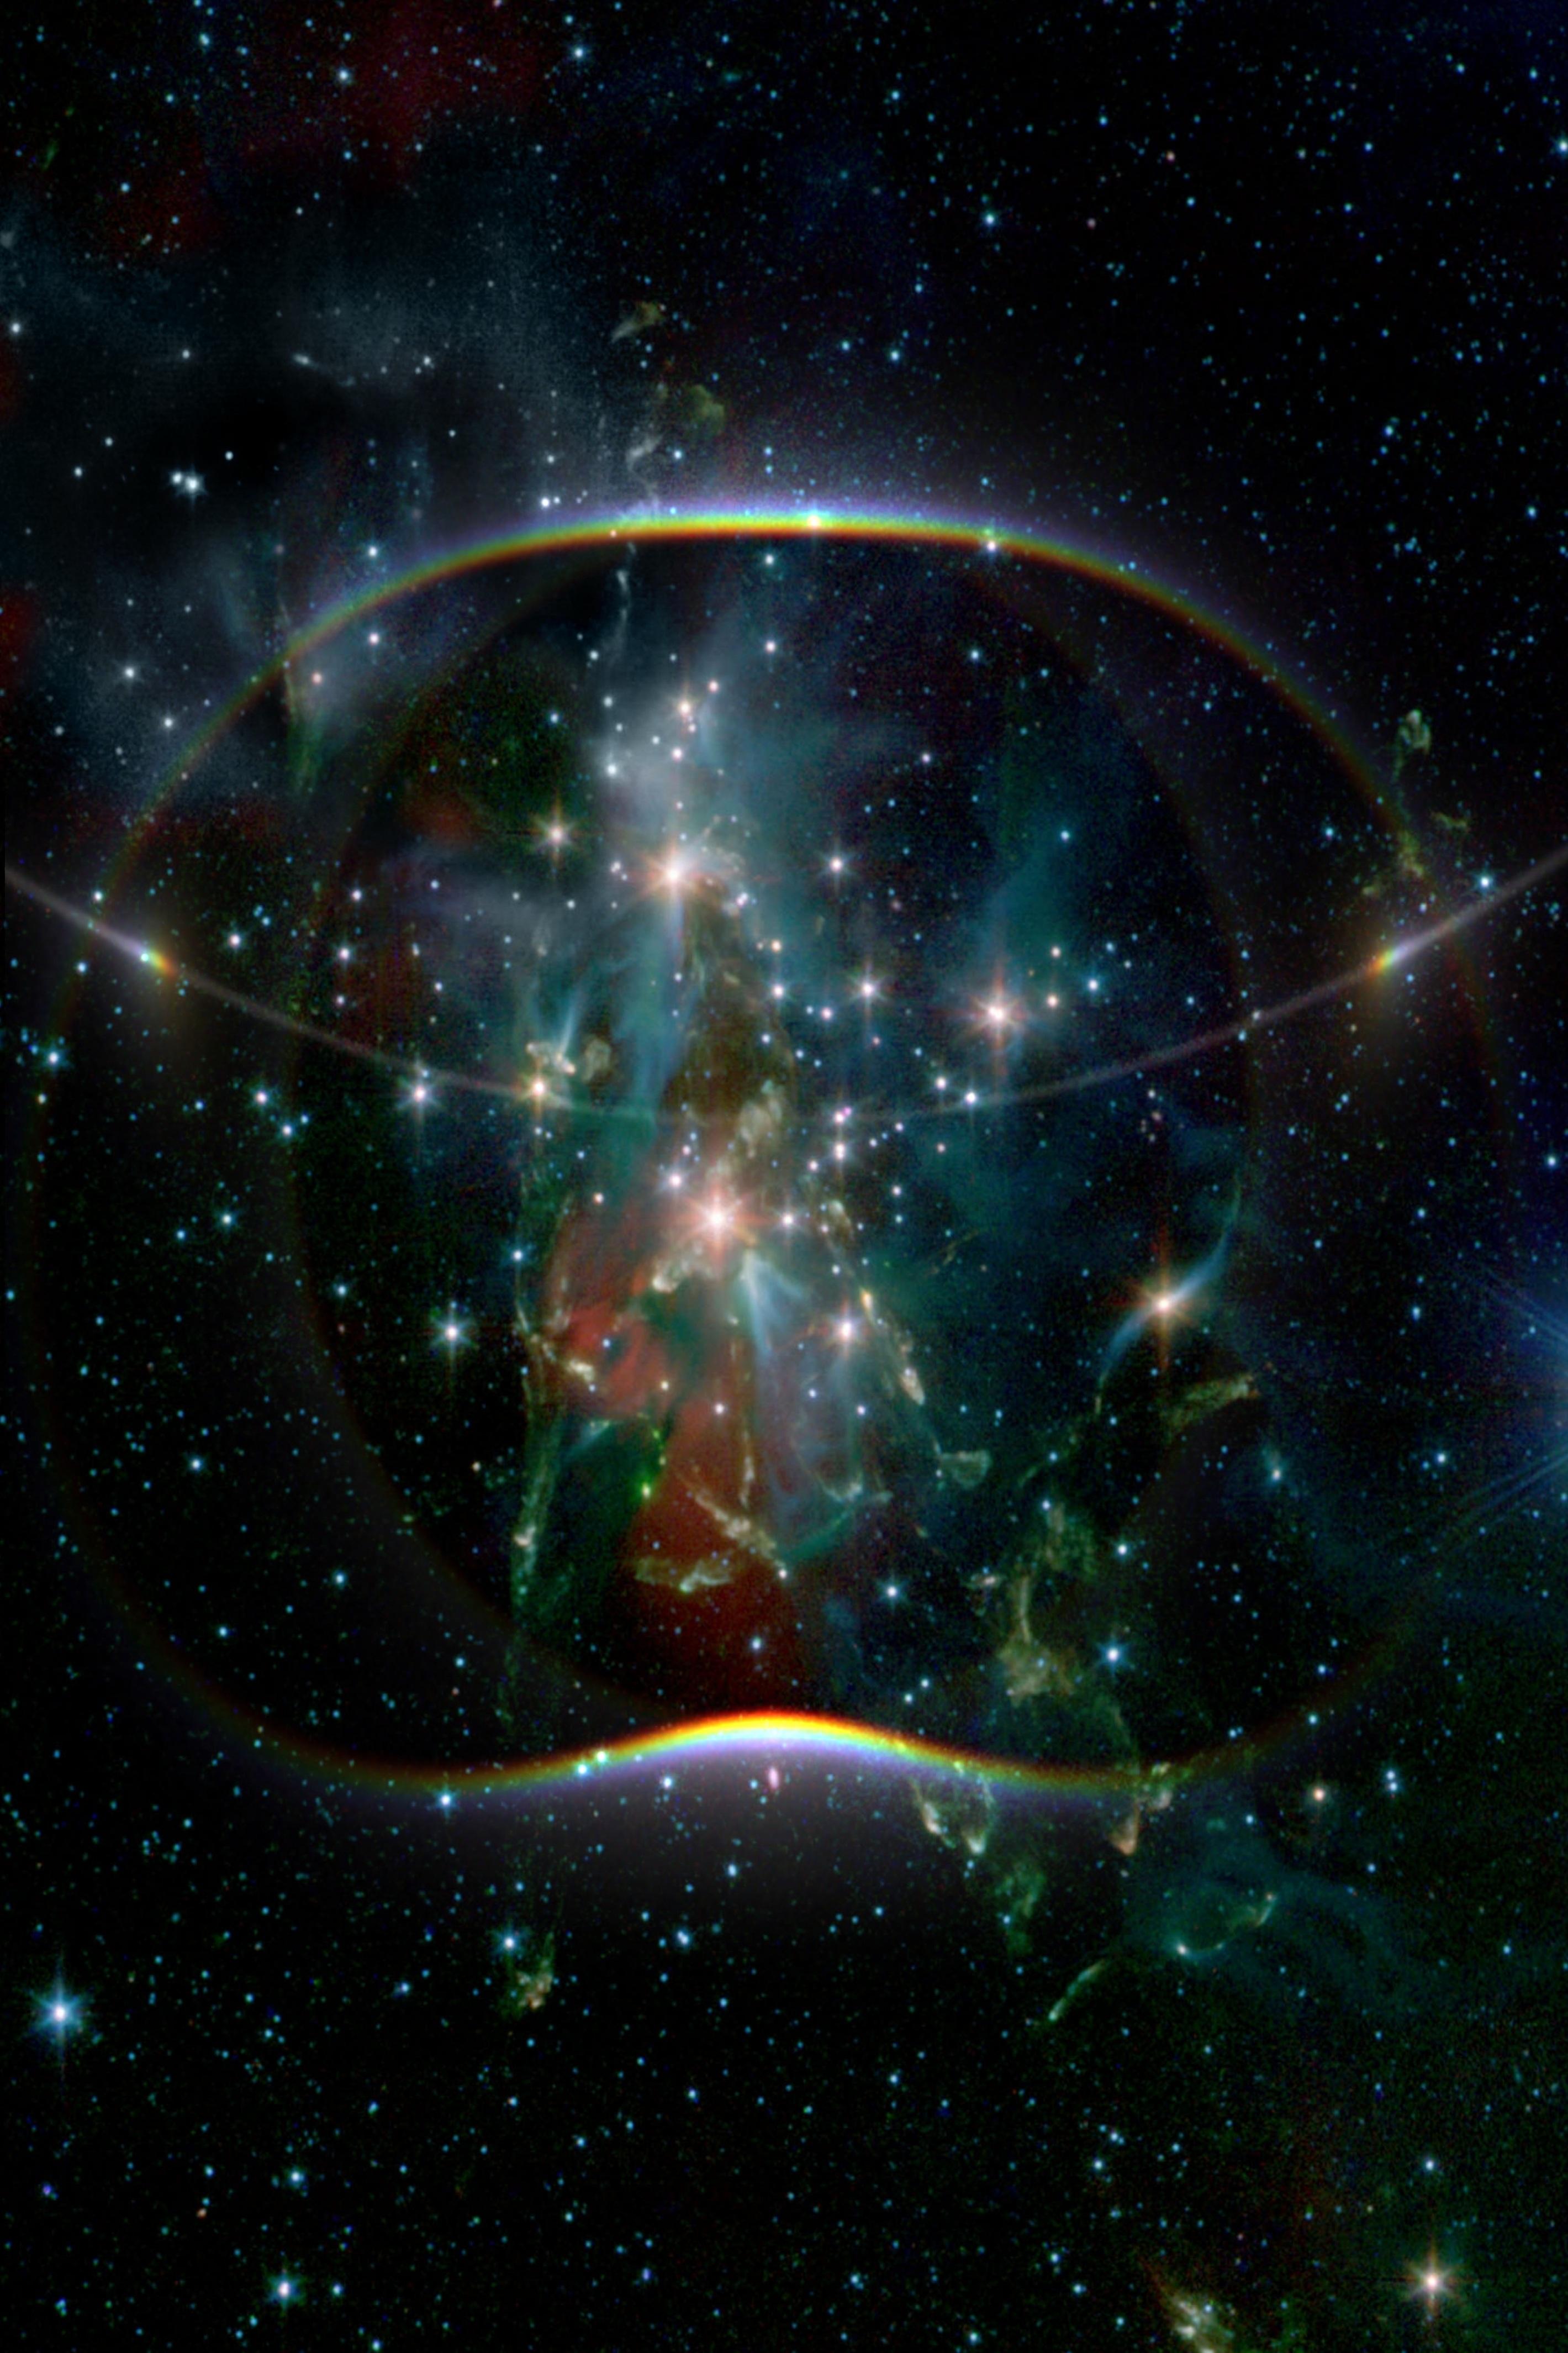 Gambar Langit Malam Bintang Kosmos Suasana Konstelasi Ruang Galaksi Nebula Luar Angkasa Ilmu Alam Semesta Fenomena Partikel Objek Astronomi Efek Khusus Komputer Wallpaper 2839x4259 1372712 Galeri Foto Pxhere